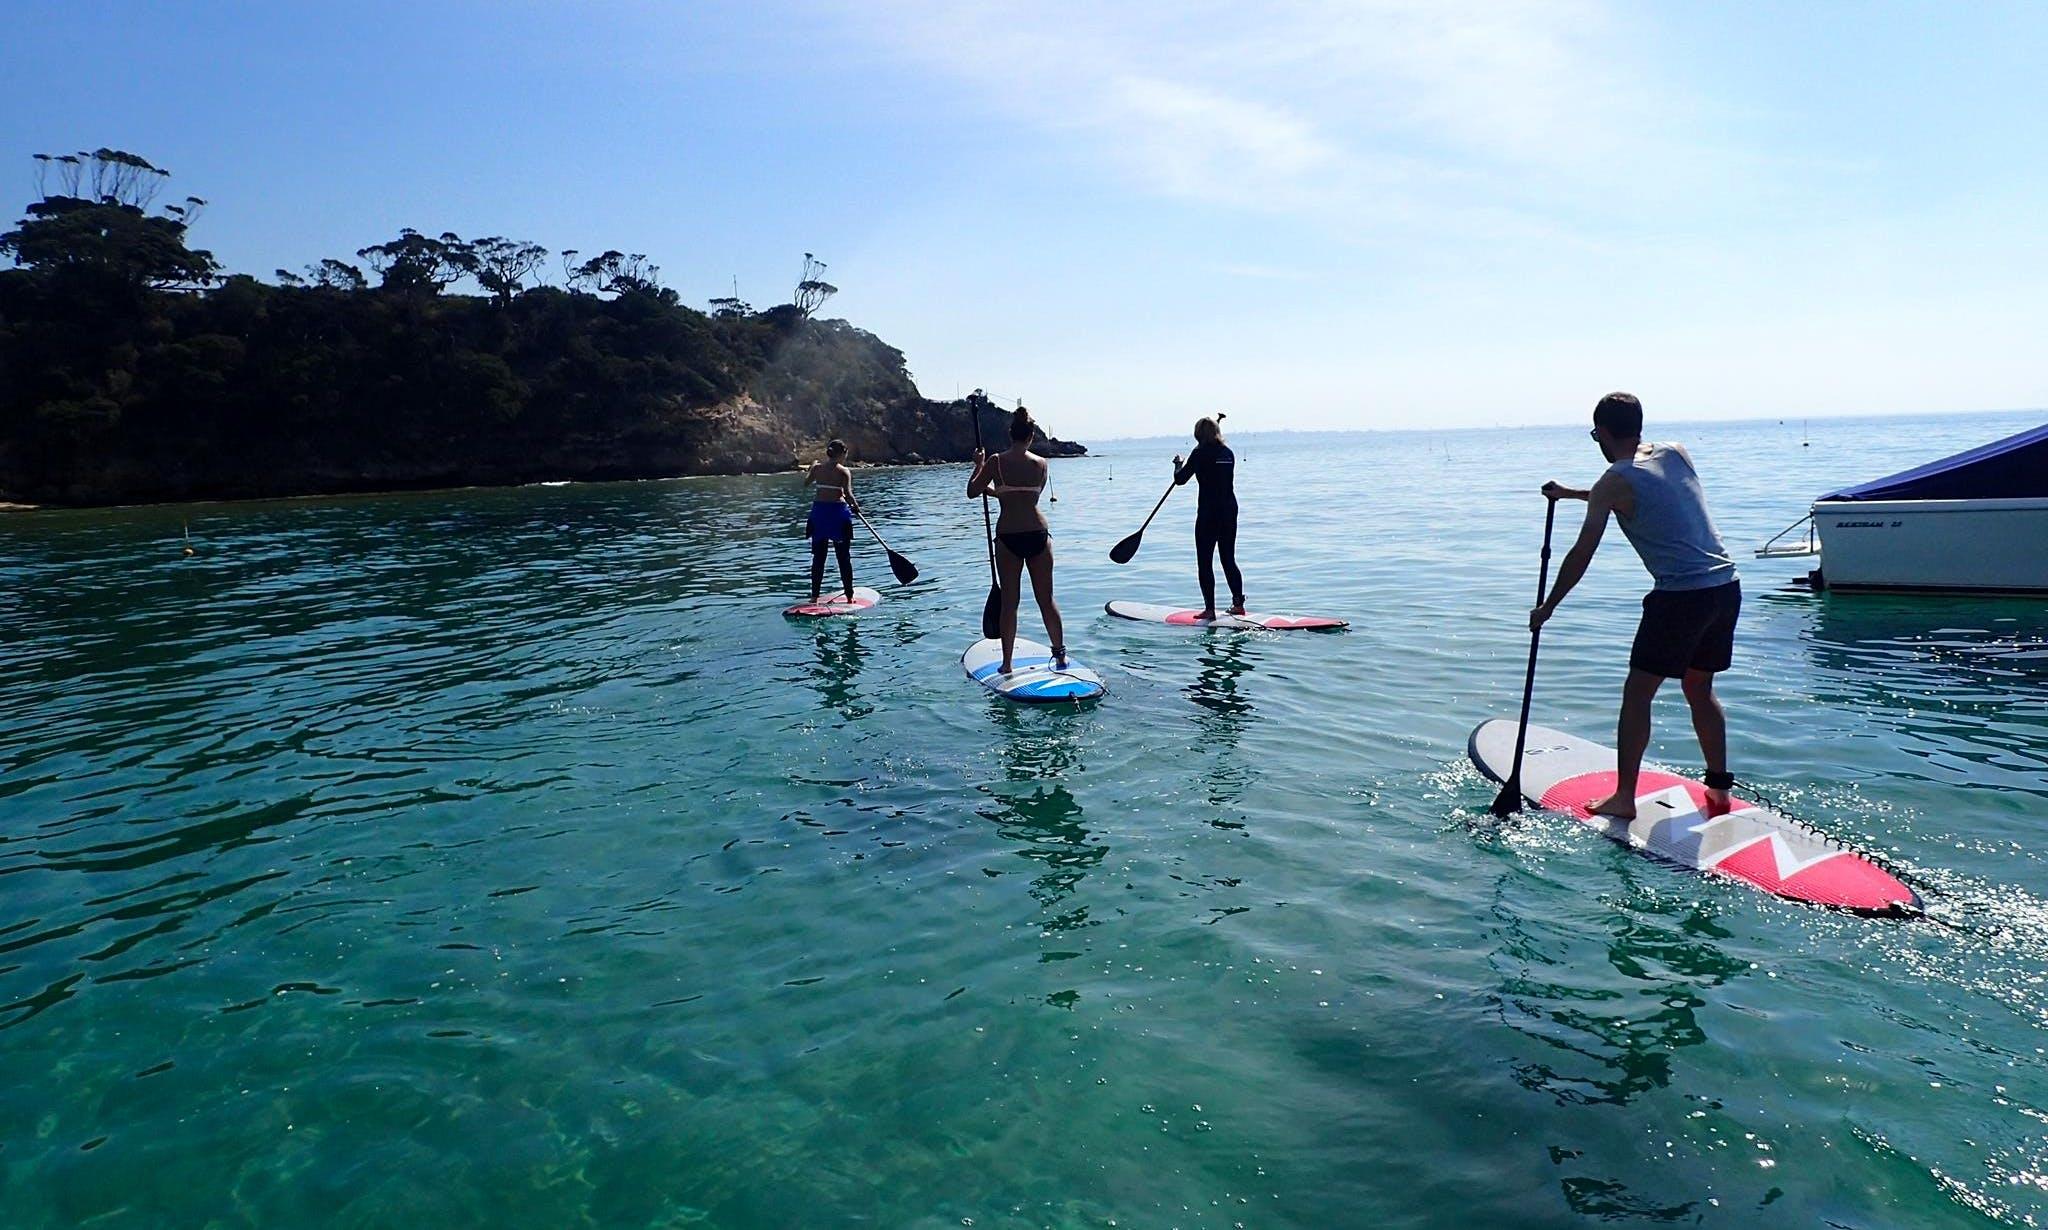 SUP Rental in Portsea, Australia